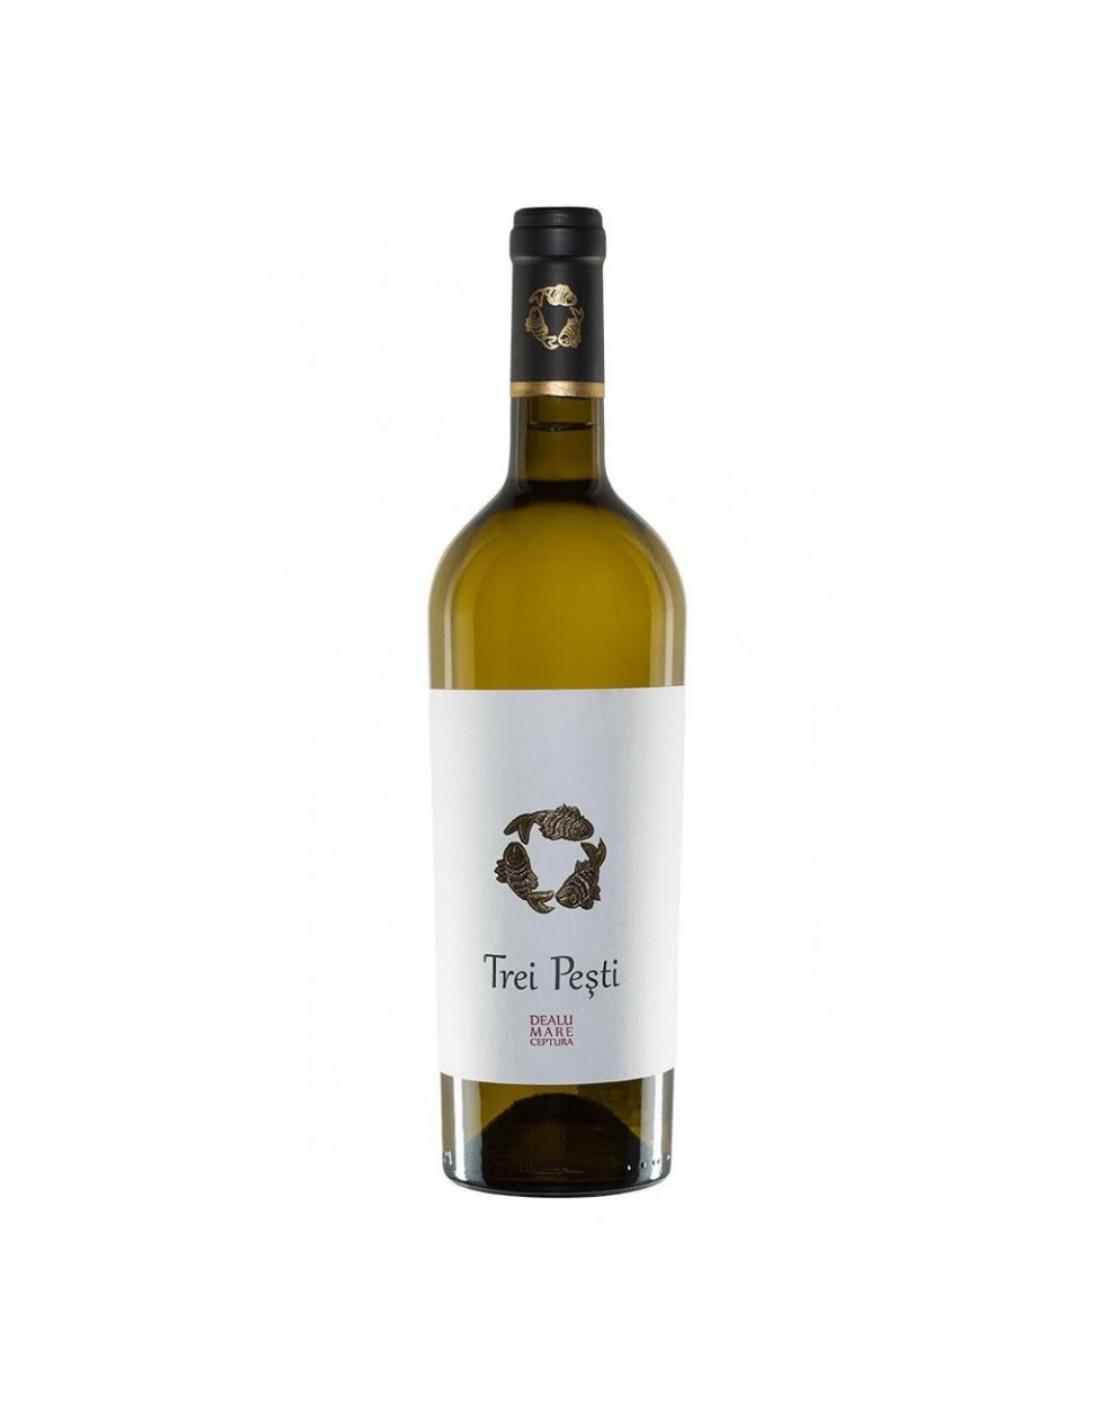 Vin alb sec, Cupaj, Domeniile Urlati Trei Pesti, 0.75L, 13.5% alc., Romania image0